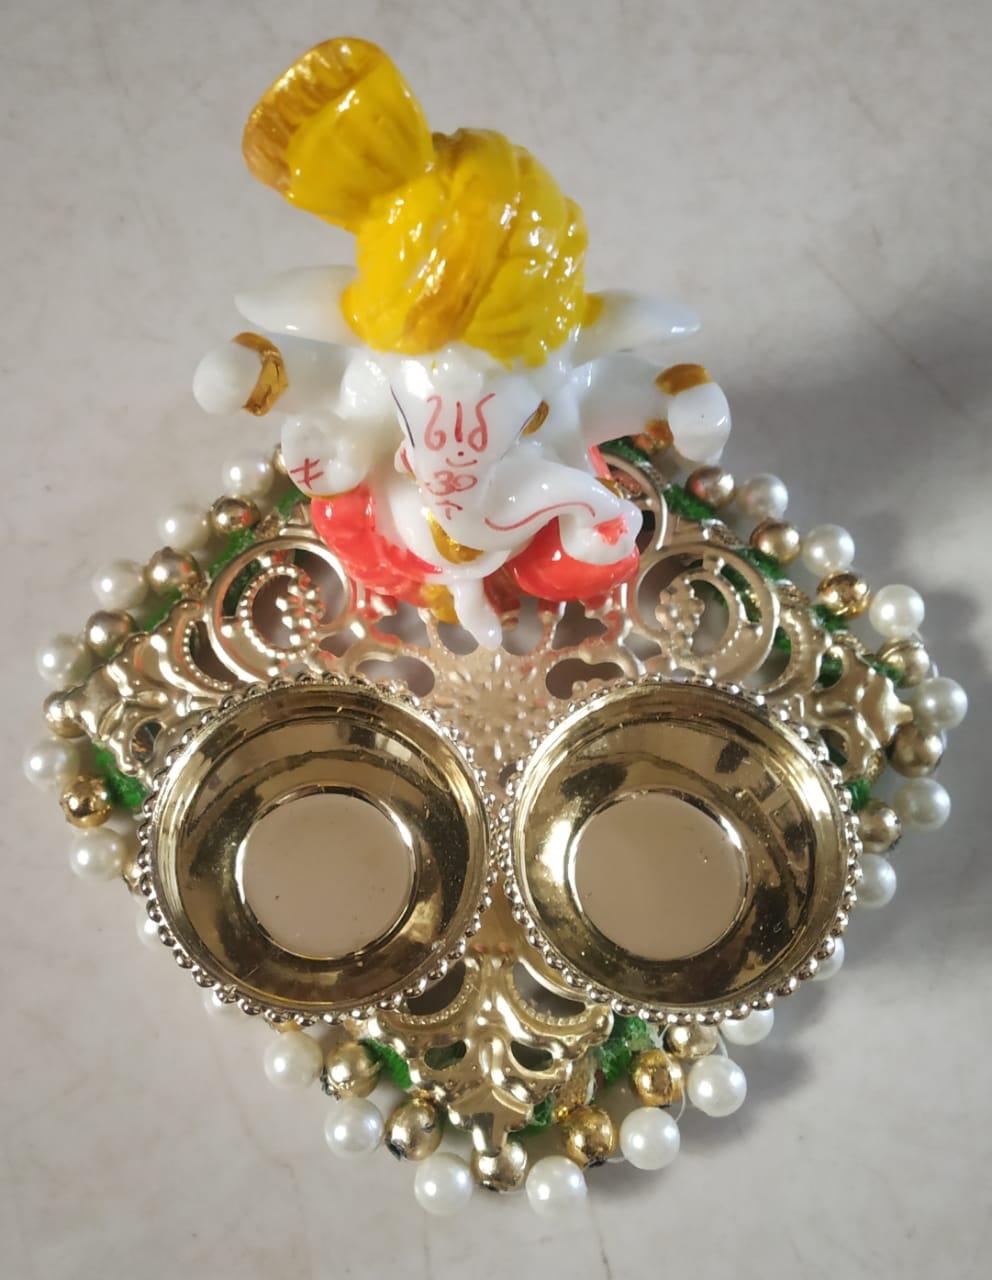 Decorative Kankavati with Ganpatiji (Roli and Chawal Platter) Slider Thumbnail 1/1